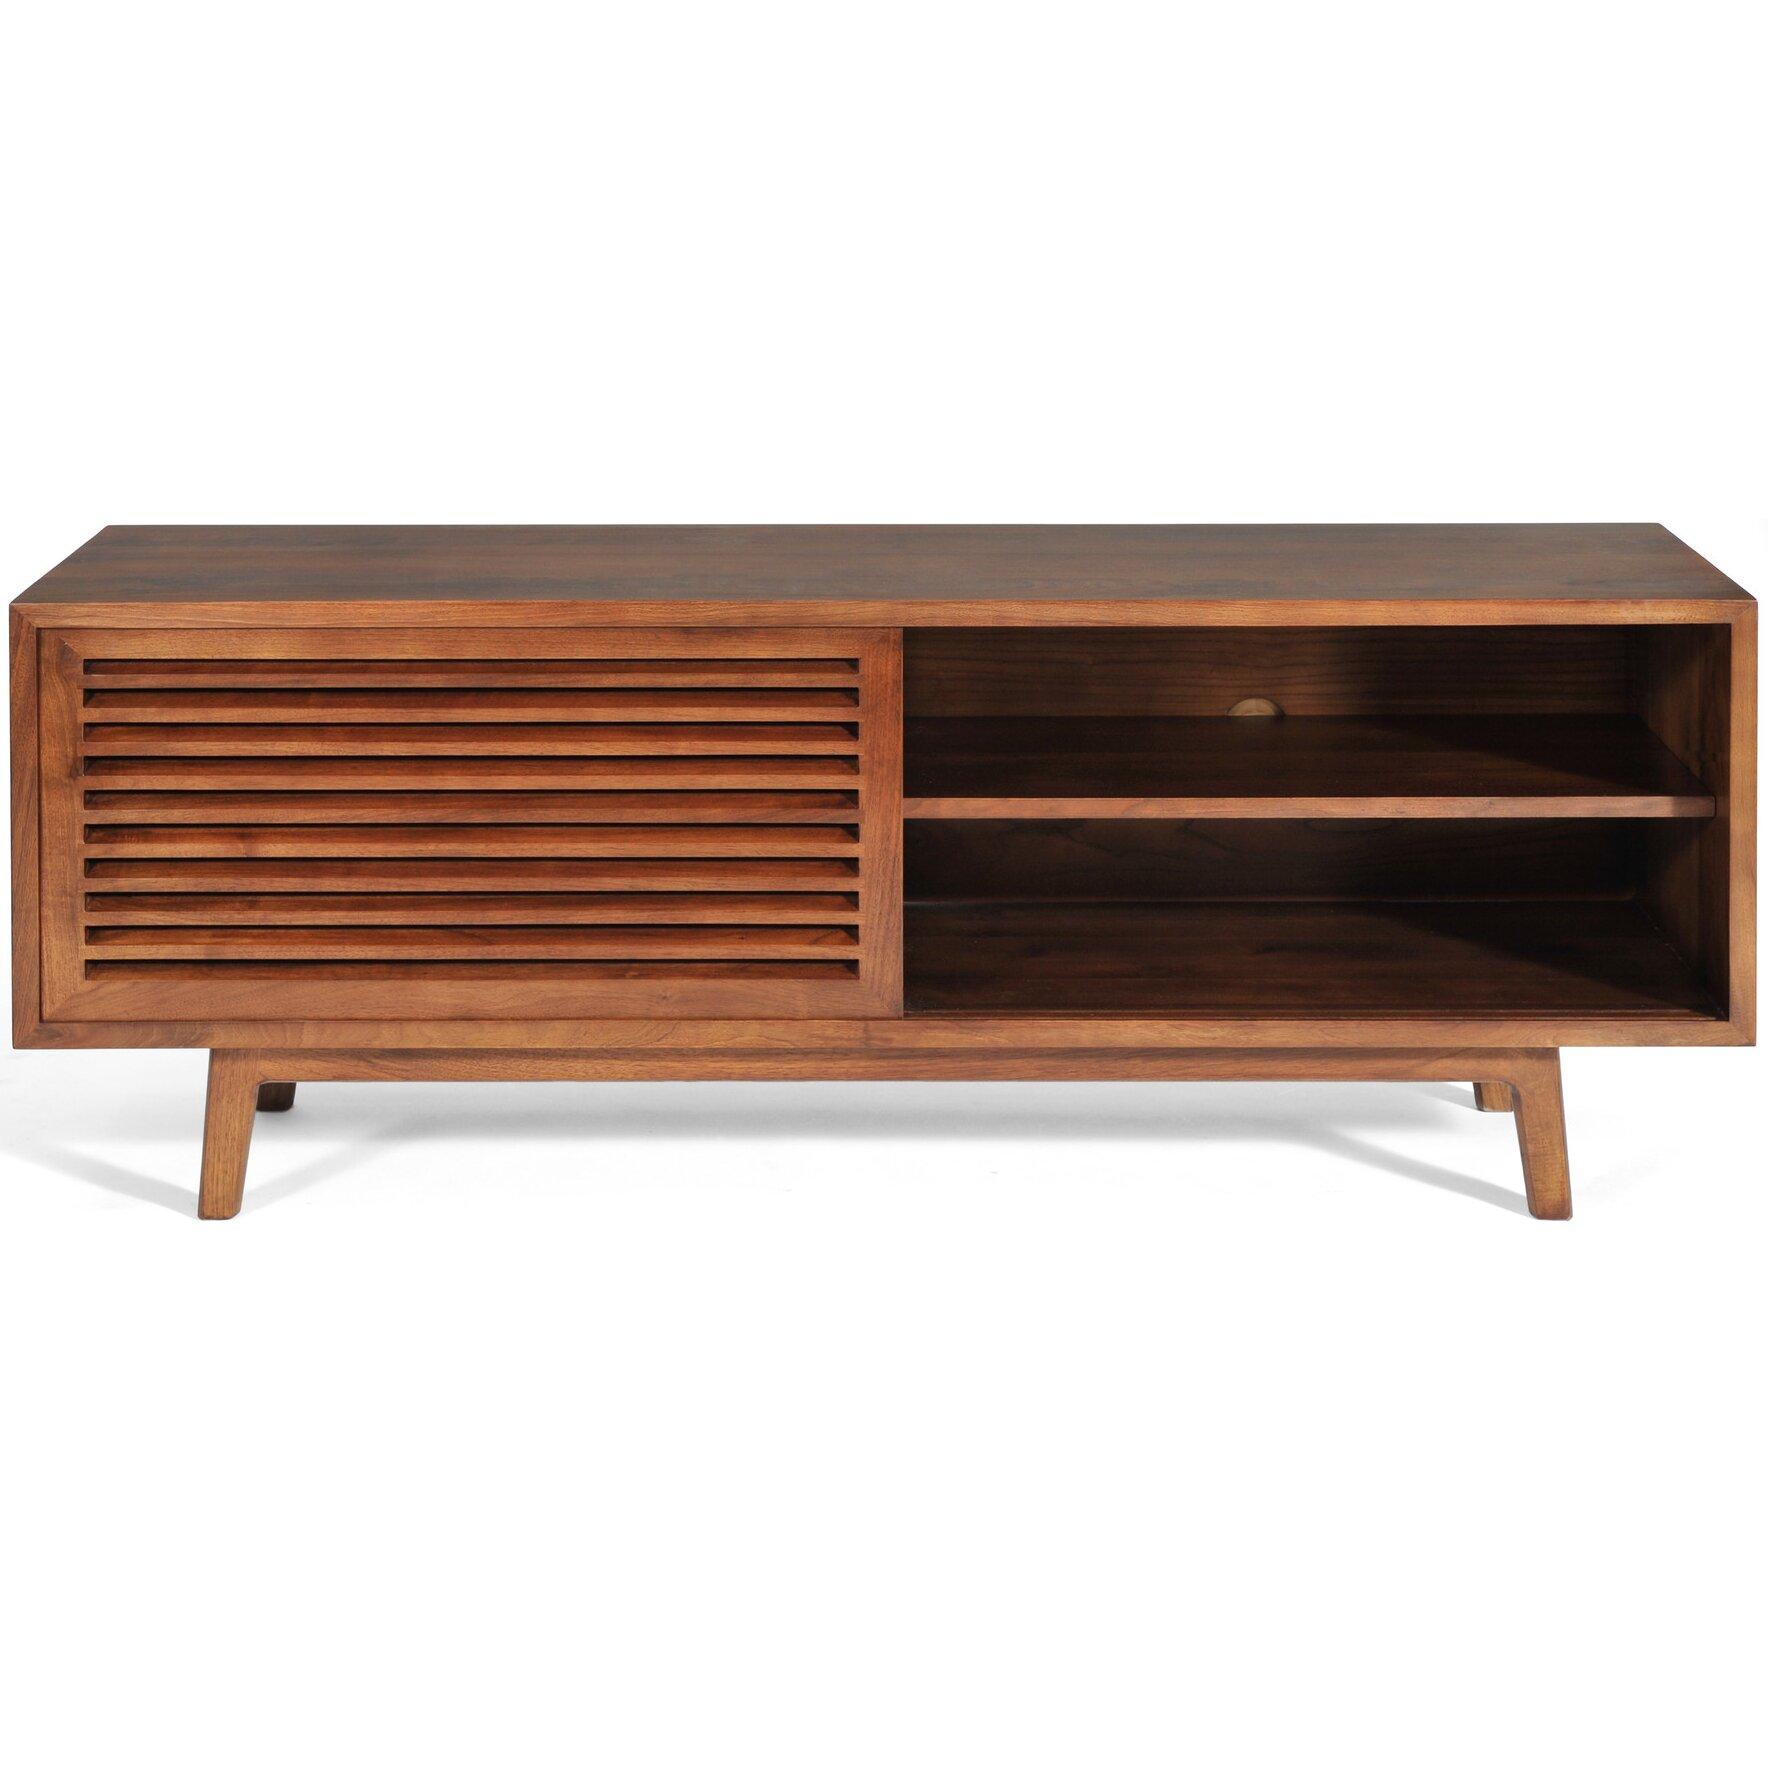 Gingko home furnishings lewis tv stand wayfair for Home decor furniture